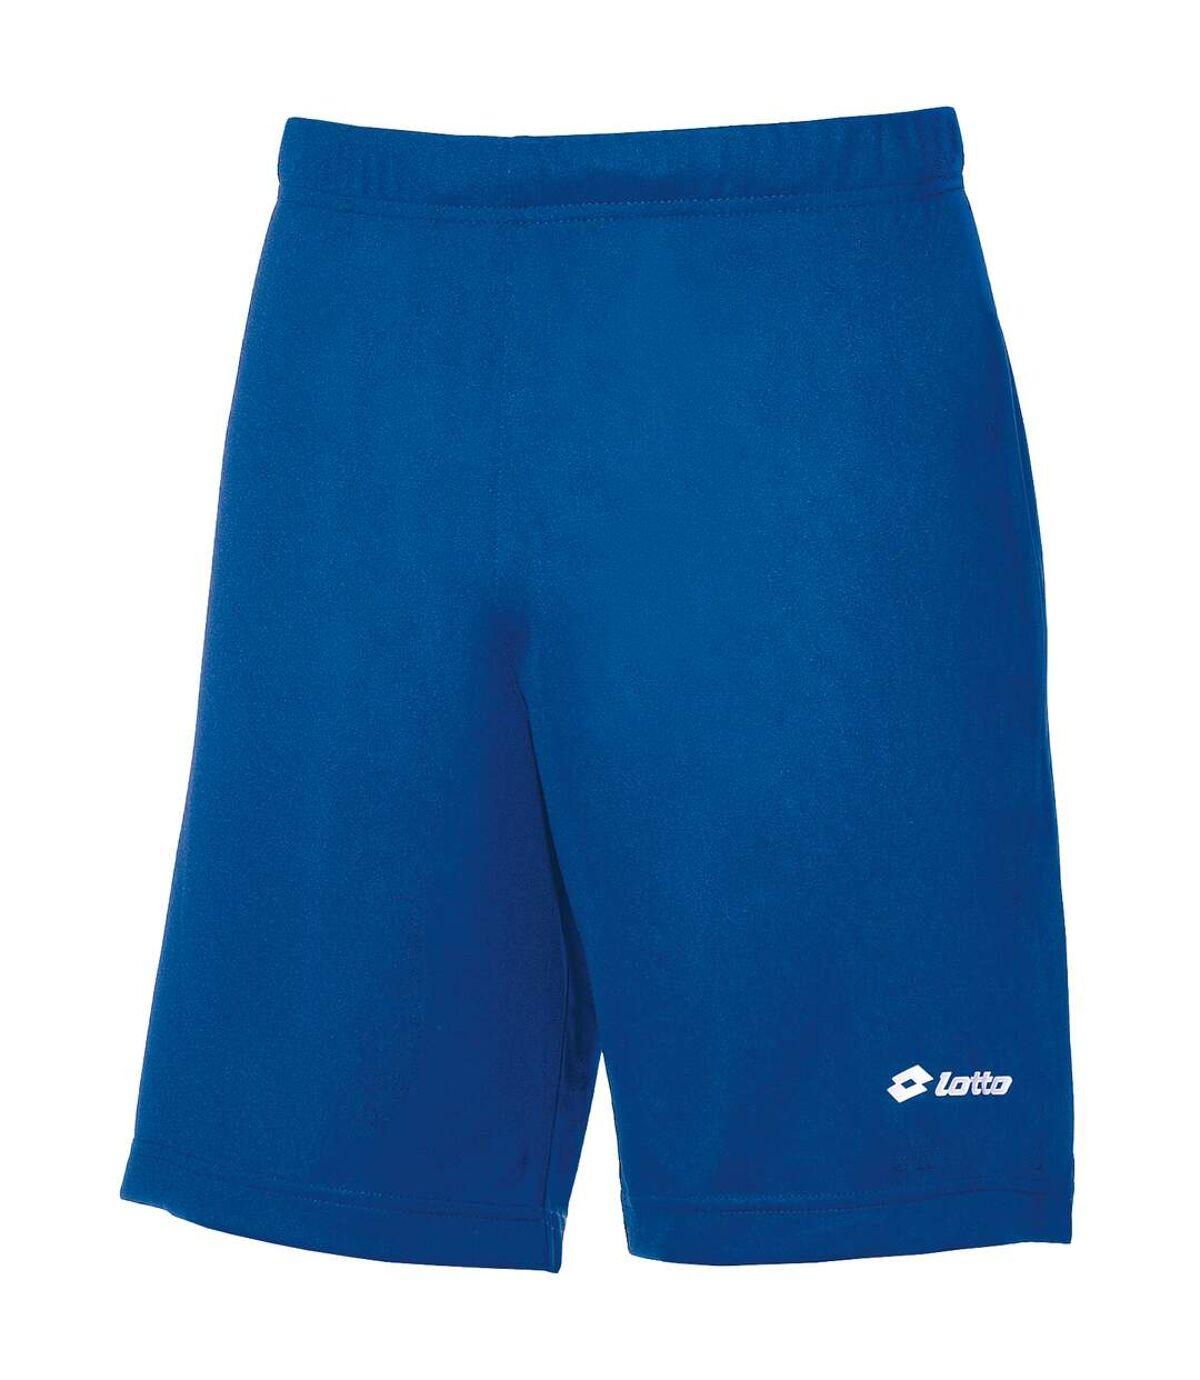 Lotto Mens Football Omega Short Sports (Flame Red) - UTRW2071